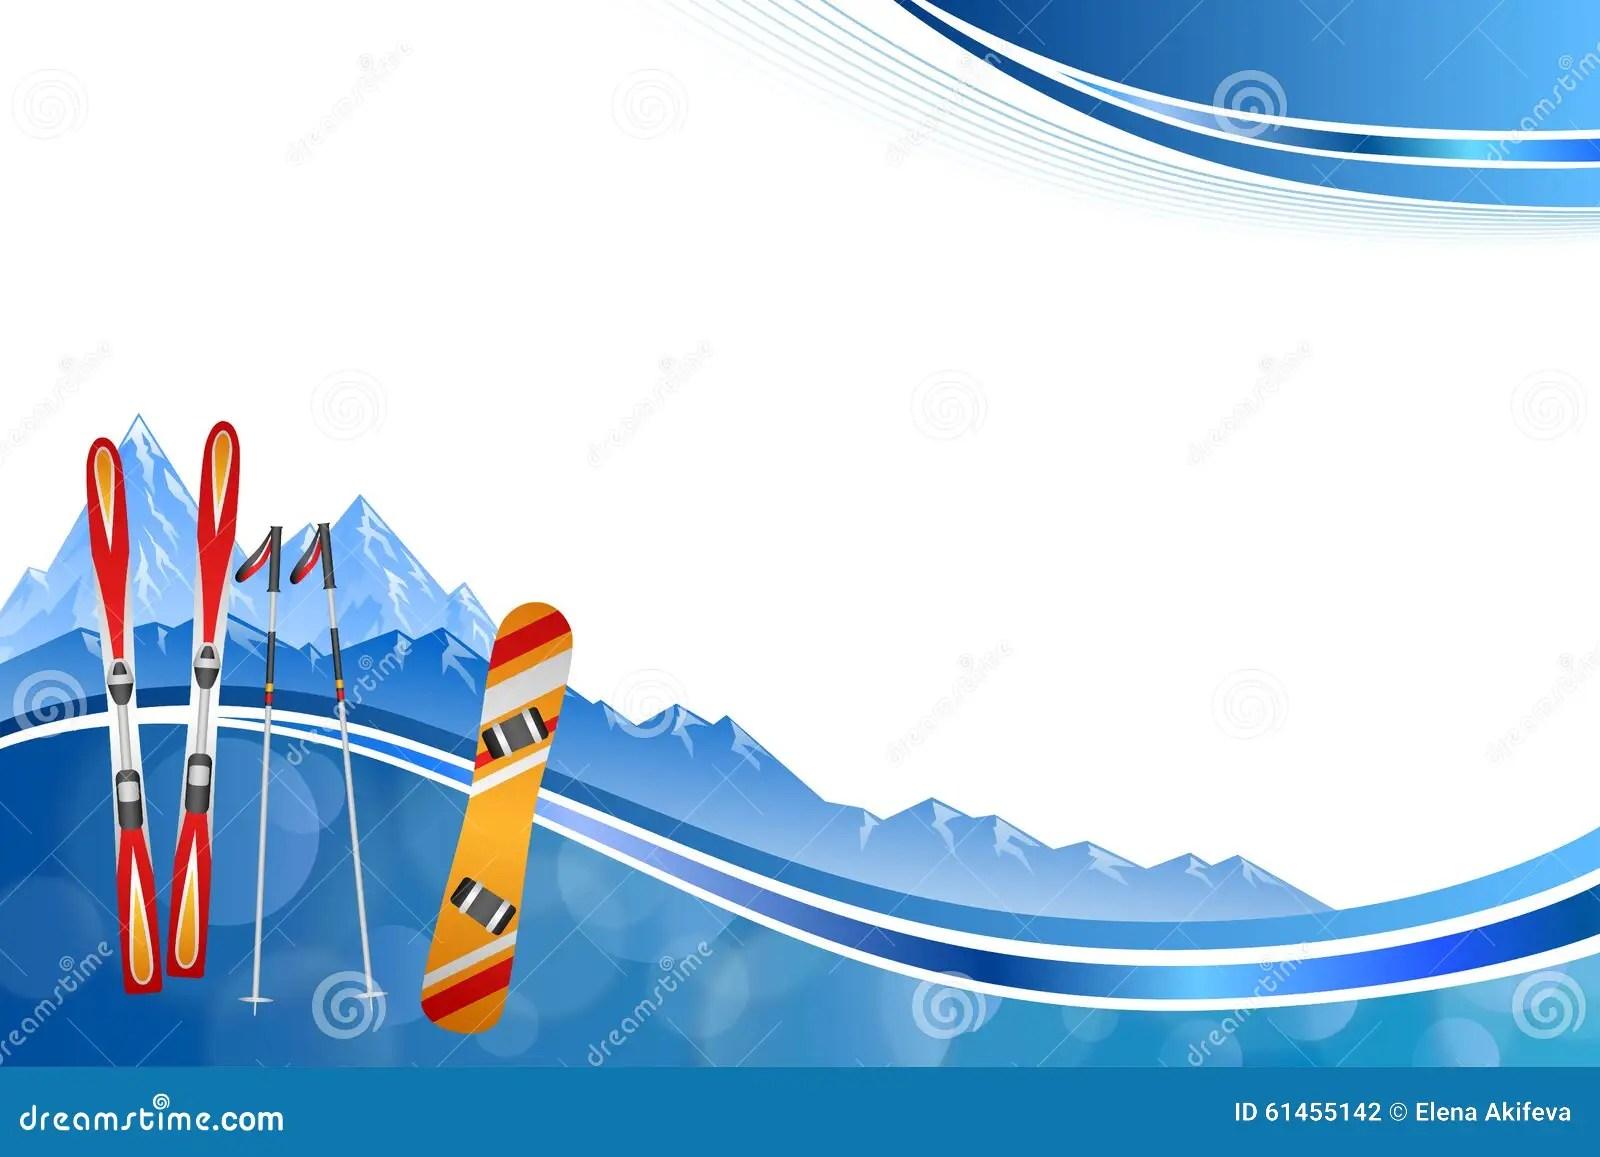 Background Abstract Blue Ski Snowboard Red Orange Winter